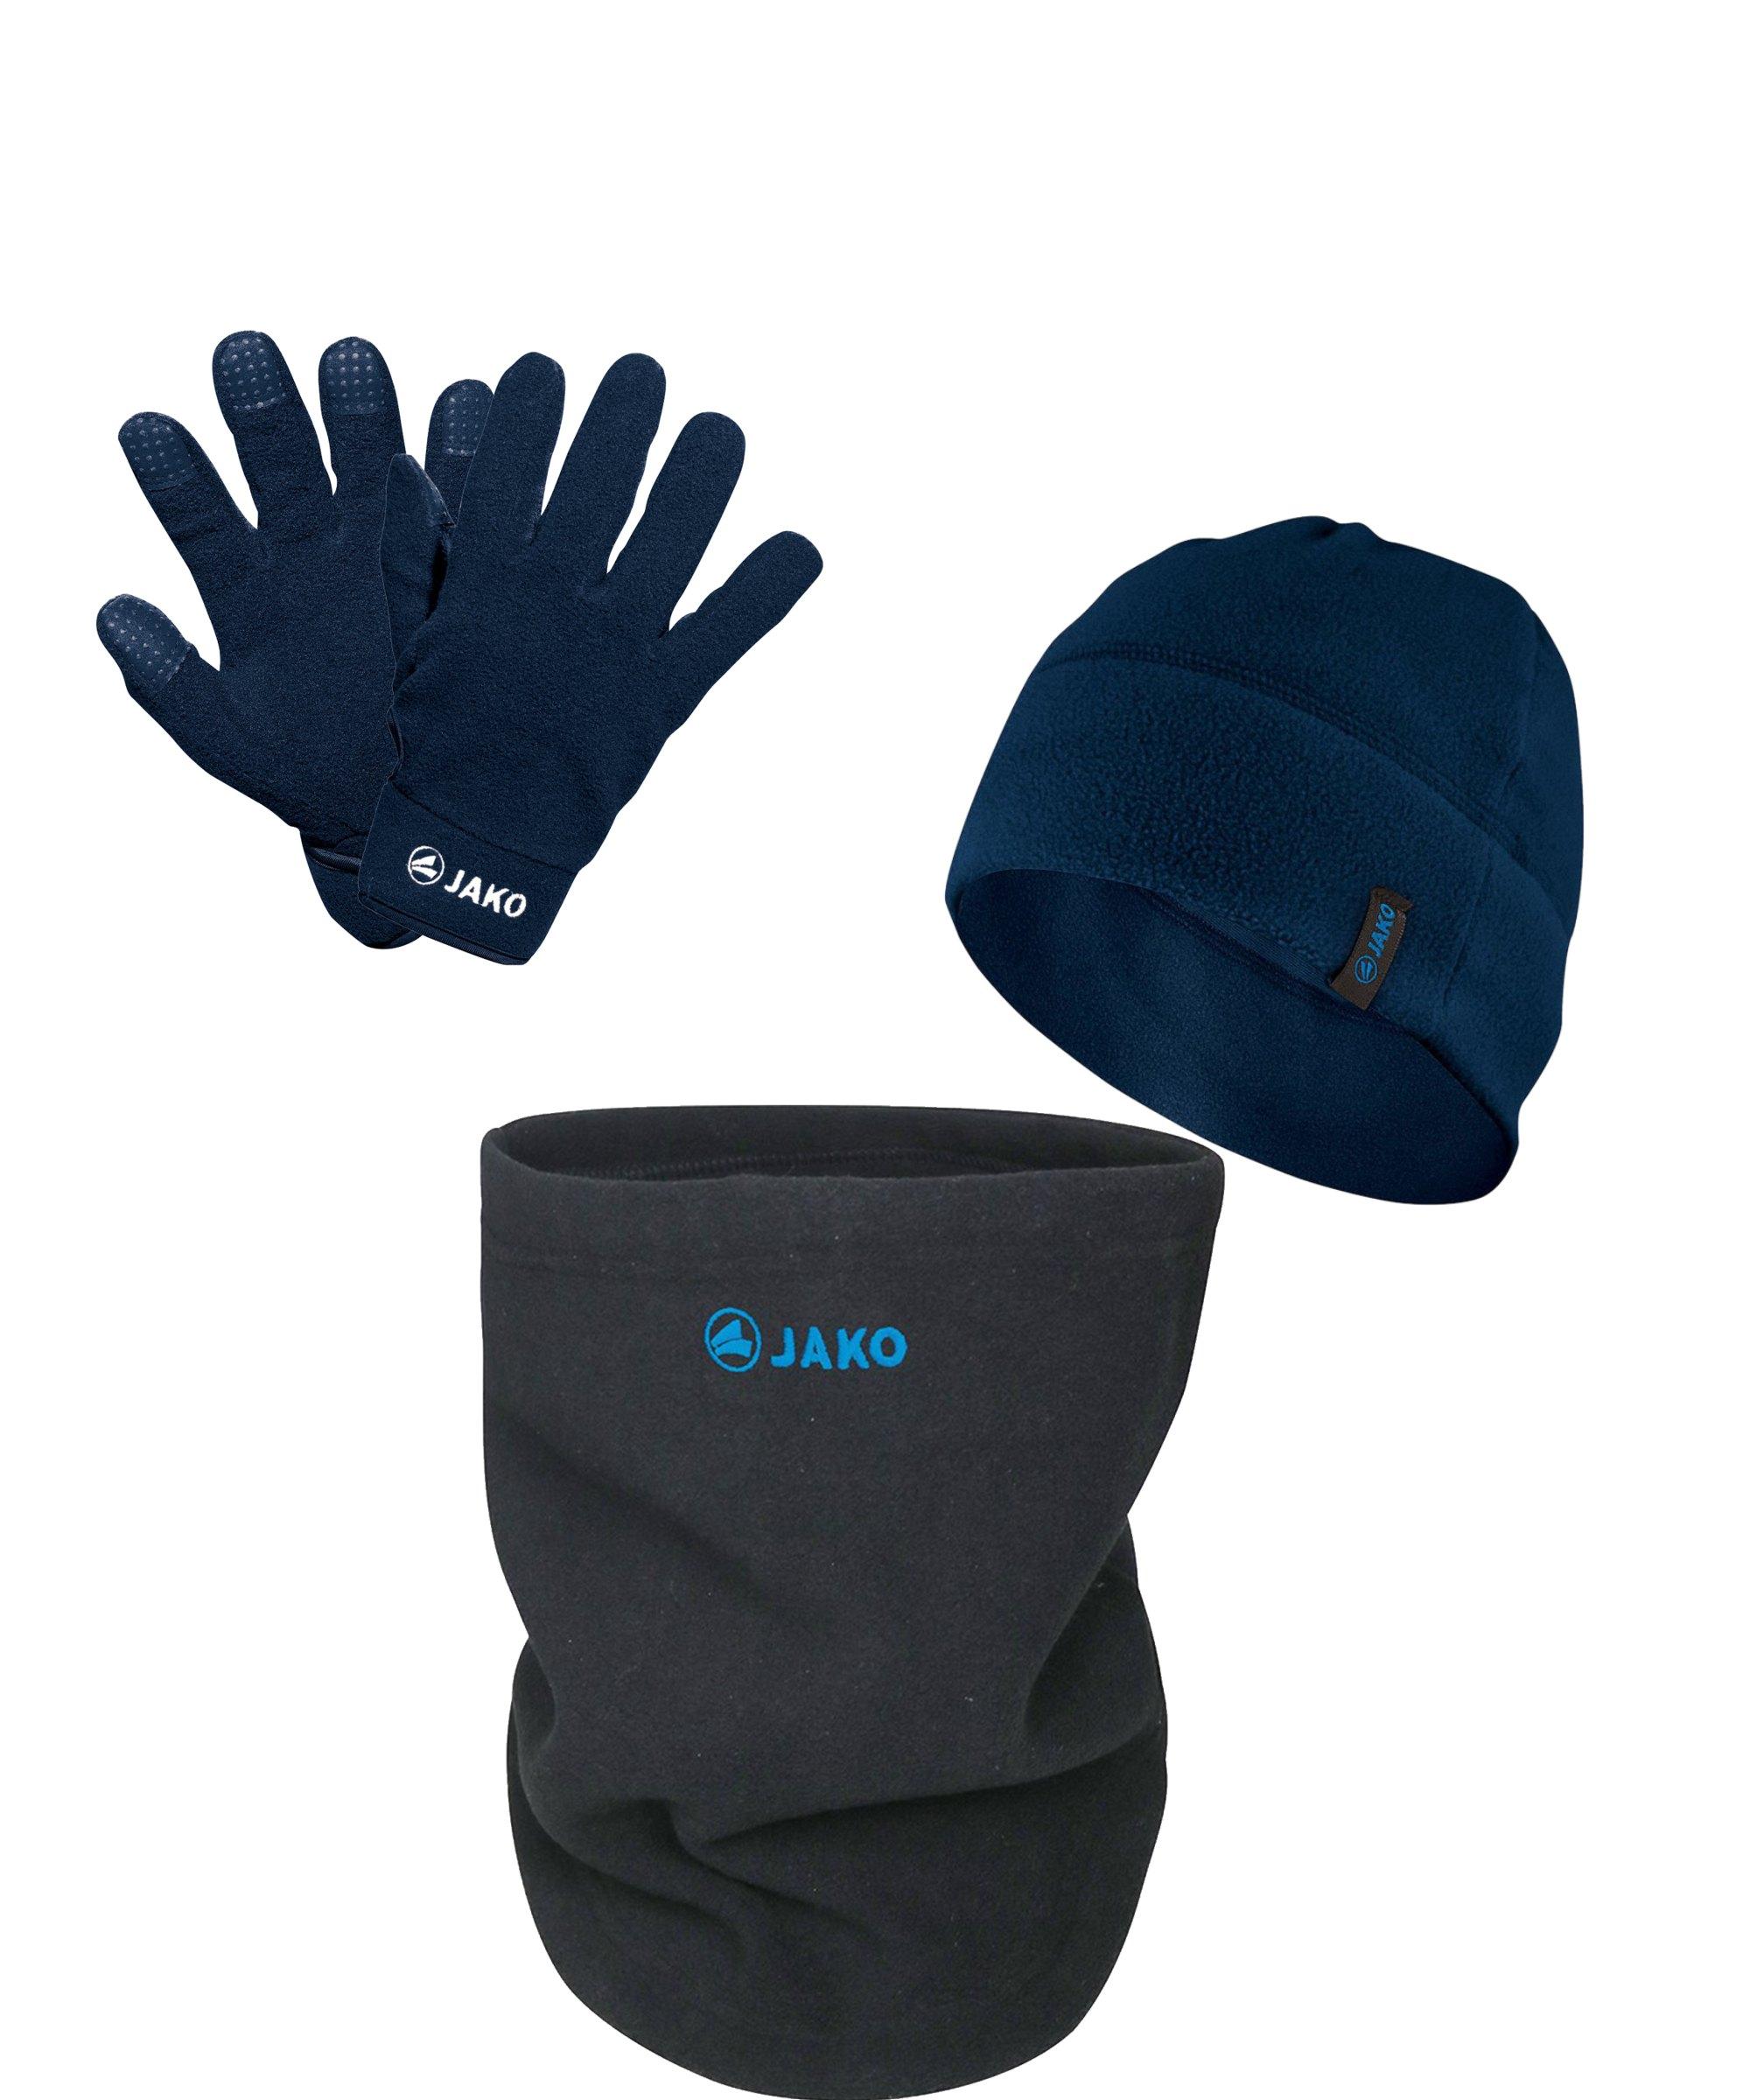 JAKO 3er Winter Set Handschuh + Beanie + Neckwarmer Blau Grau - blau